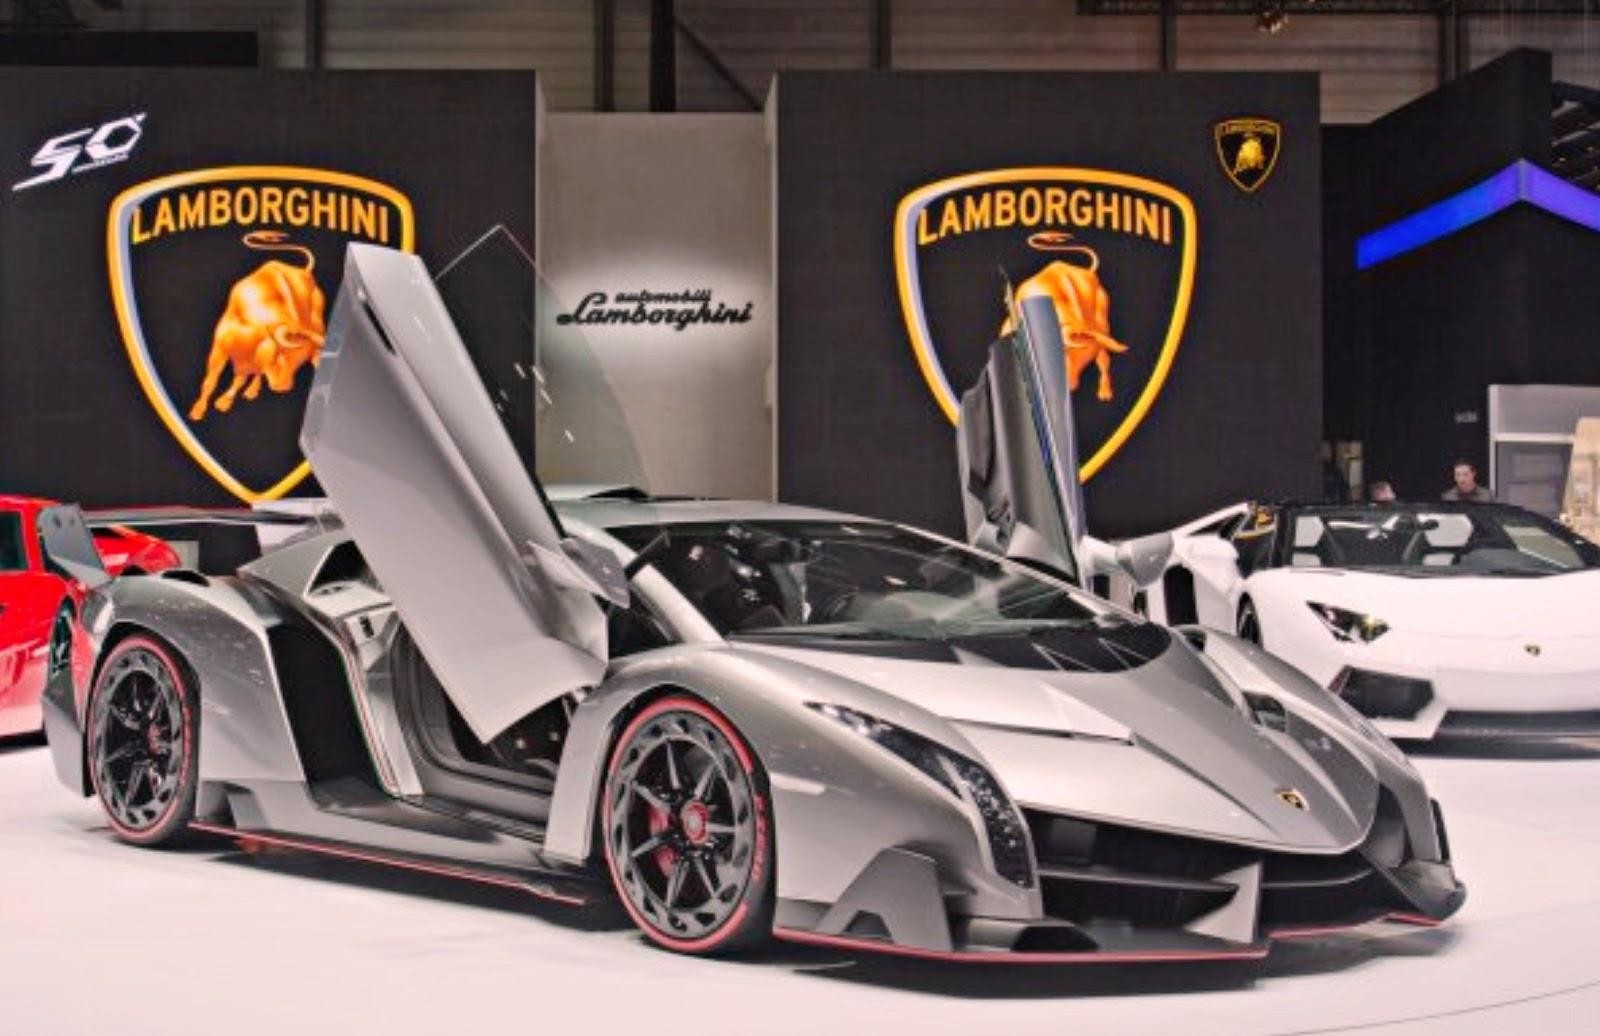 image - 2014 lamborghini veneno hd car | autopedia | fandom